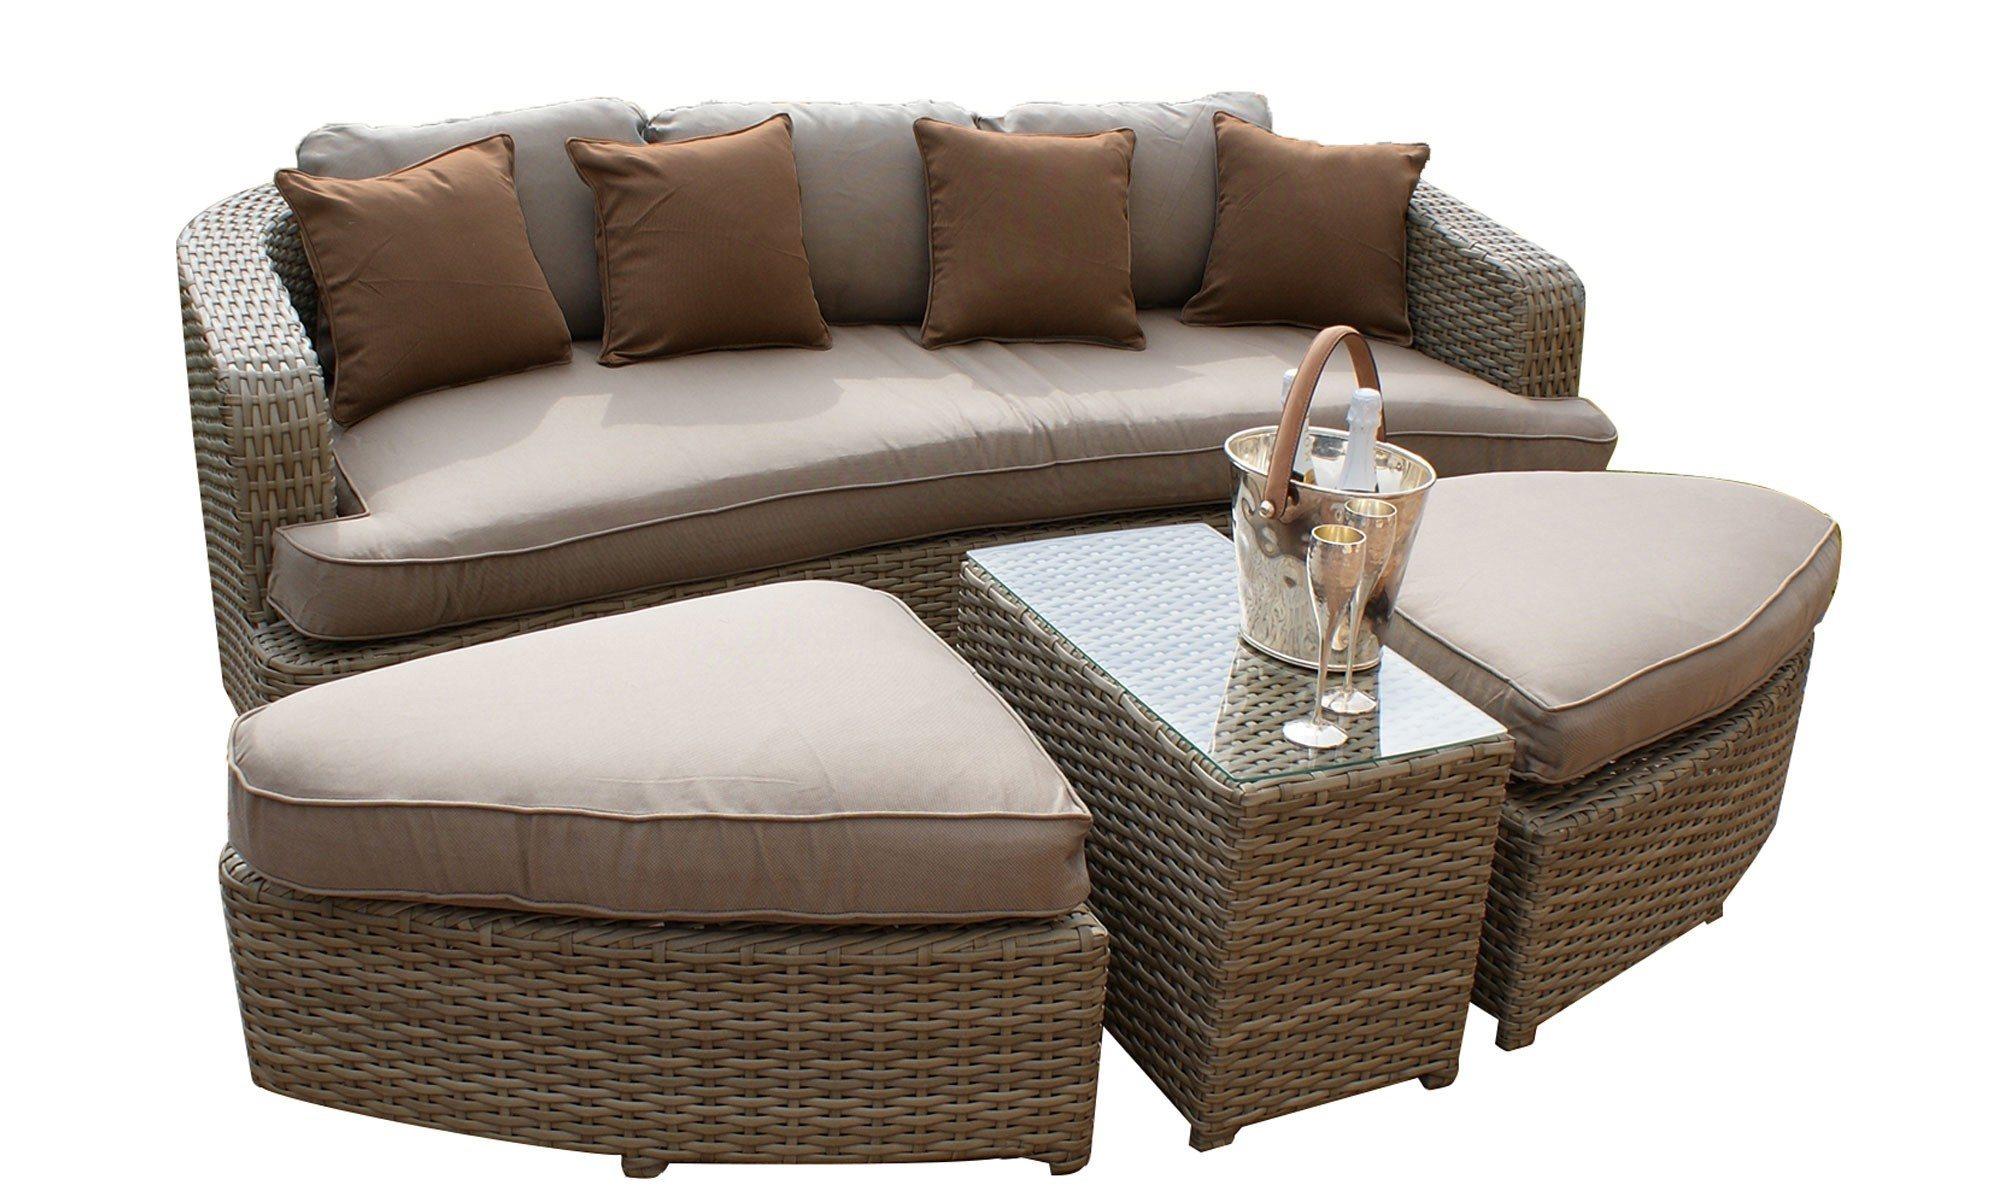 Well Furnir 4 Piece outdoor rattan sofa bed   Wellfurnir